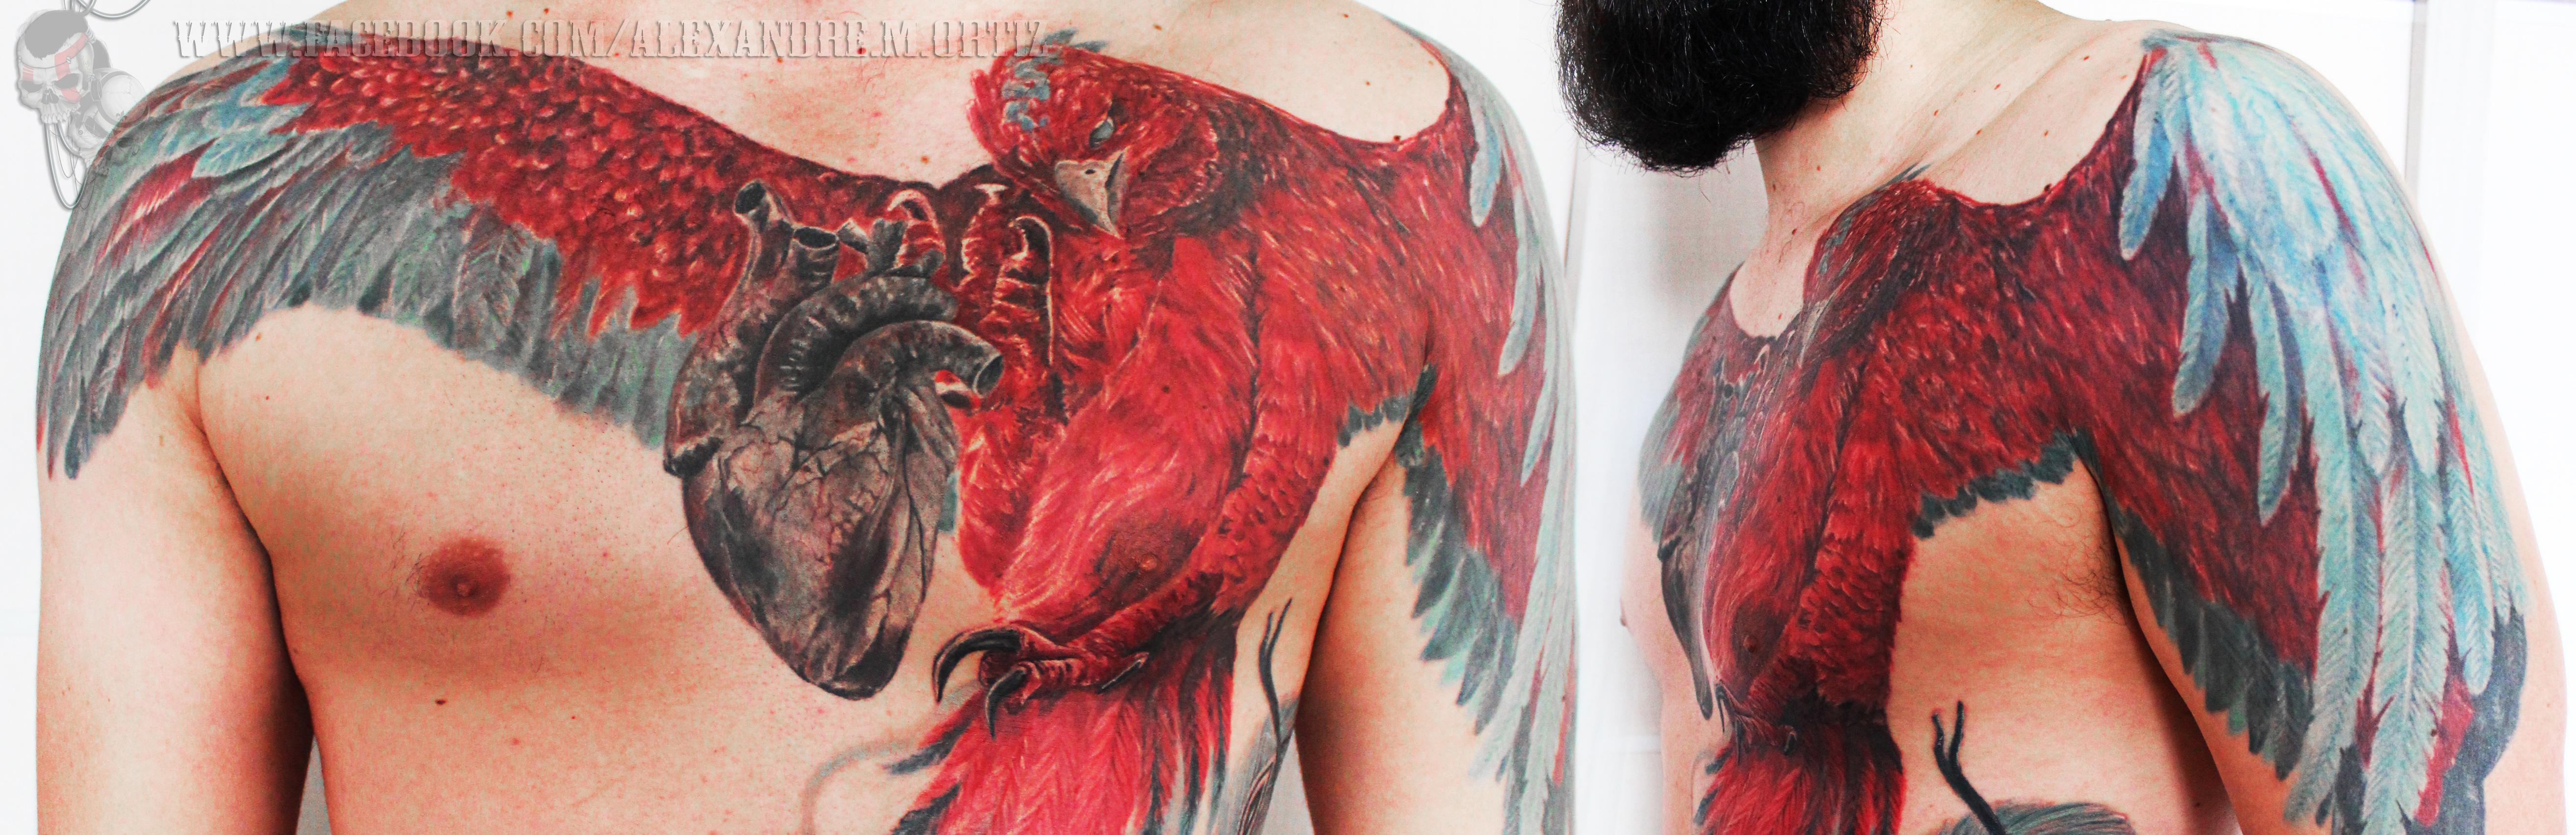 Phoenix padrim333